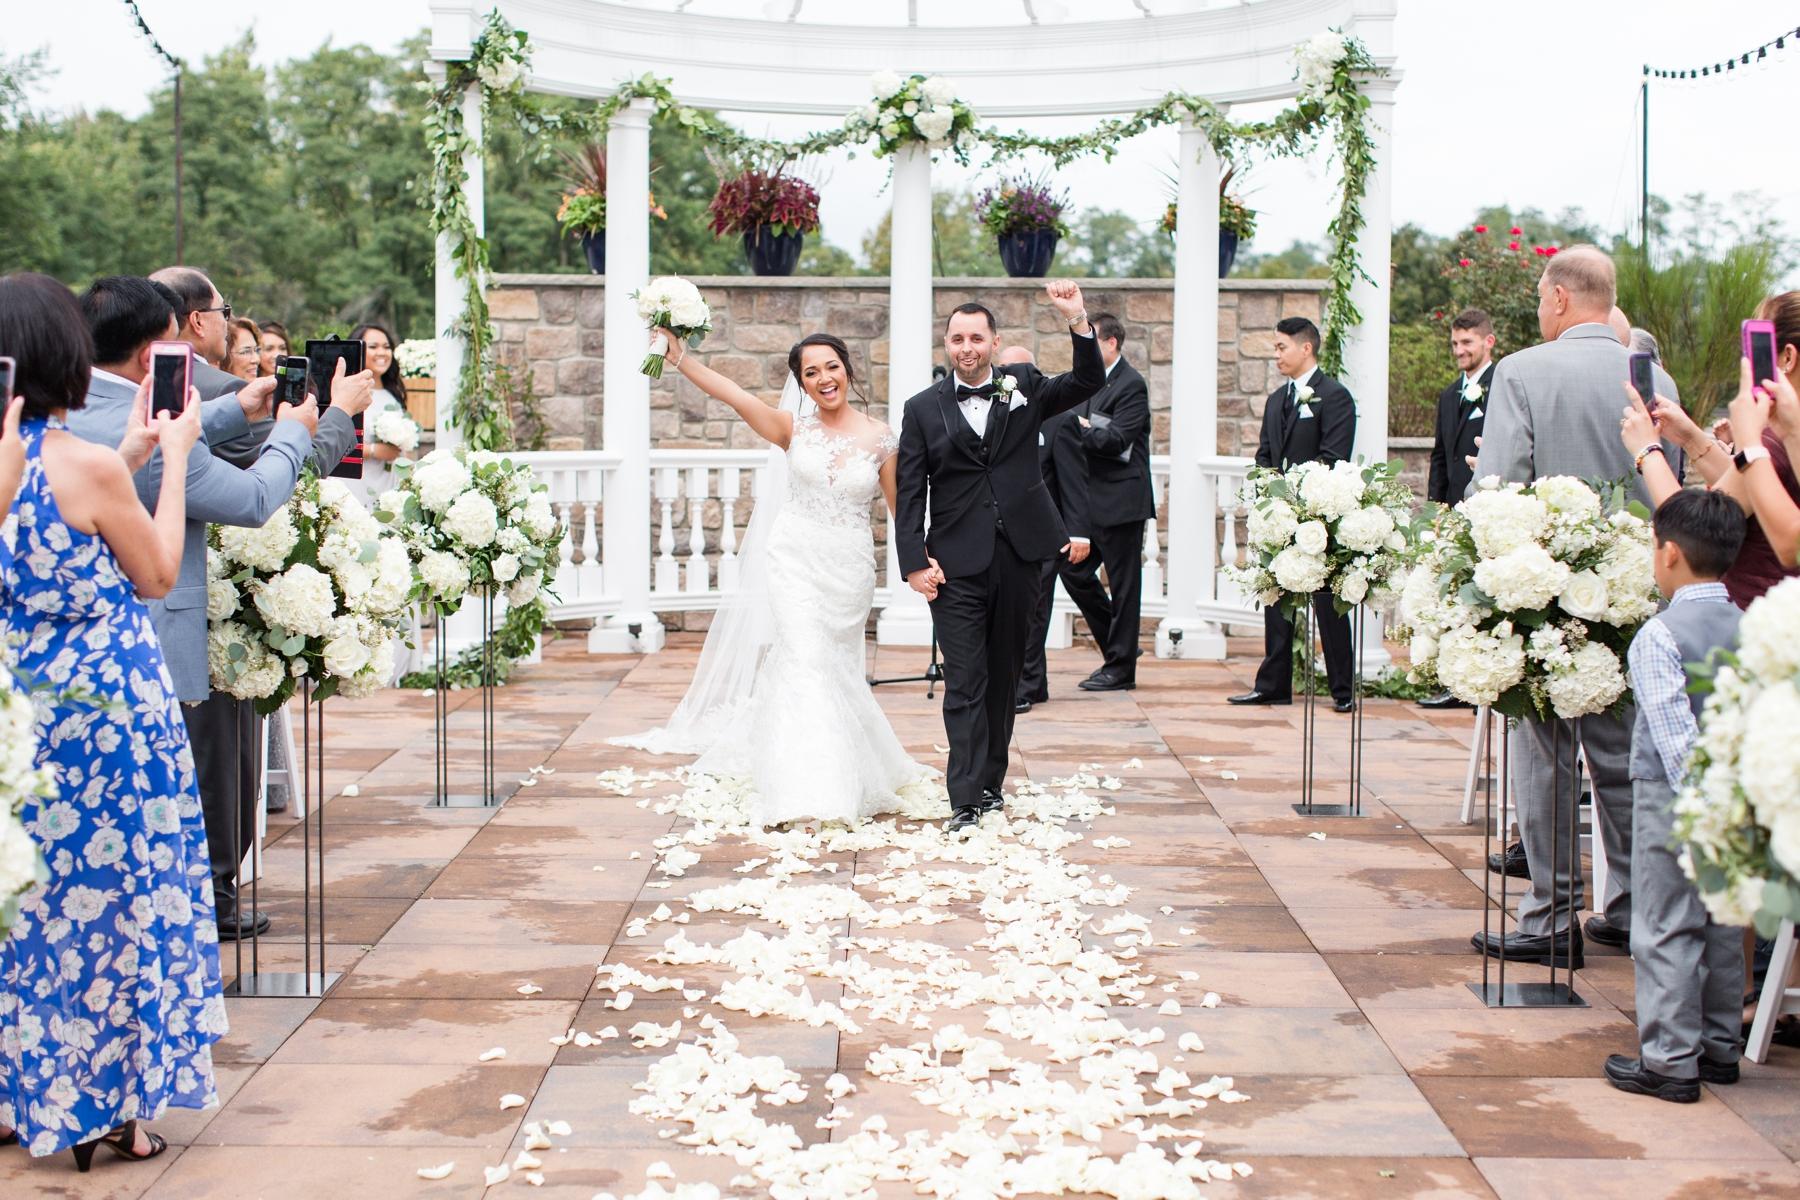 Wedding At The Terrace in Paramus, NJ